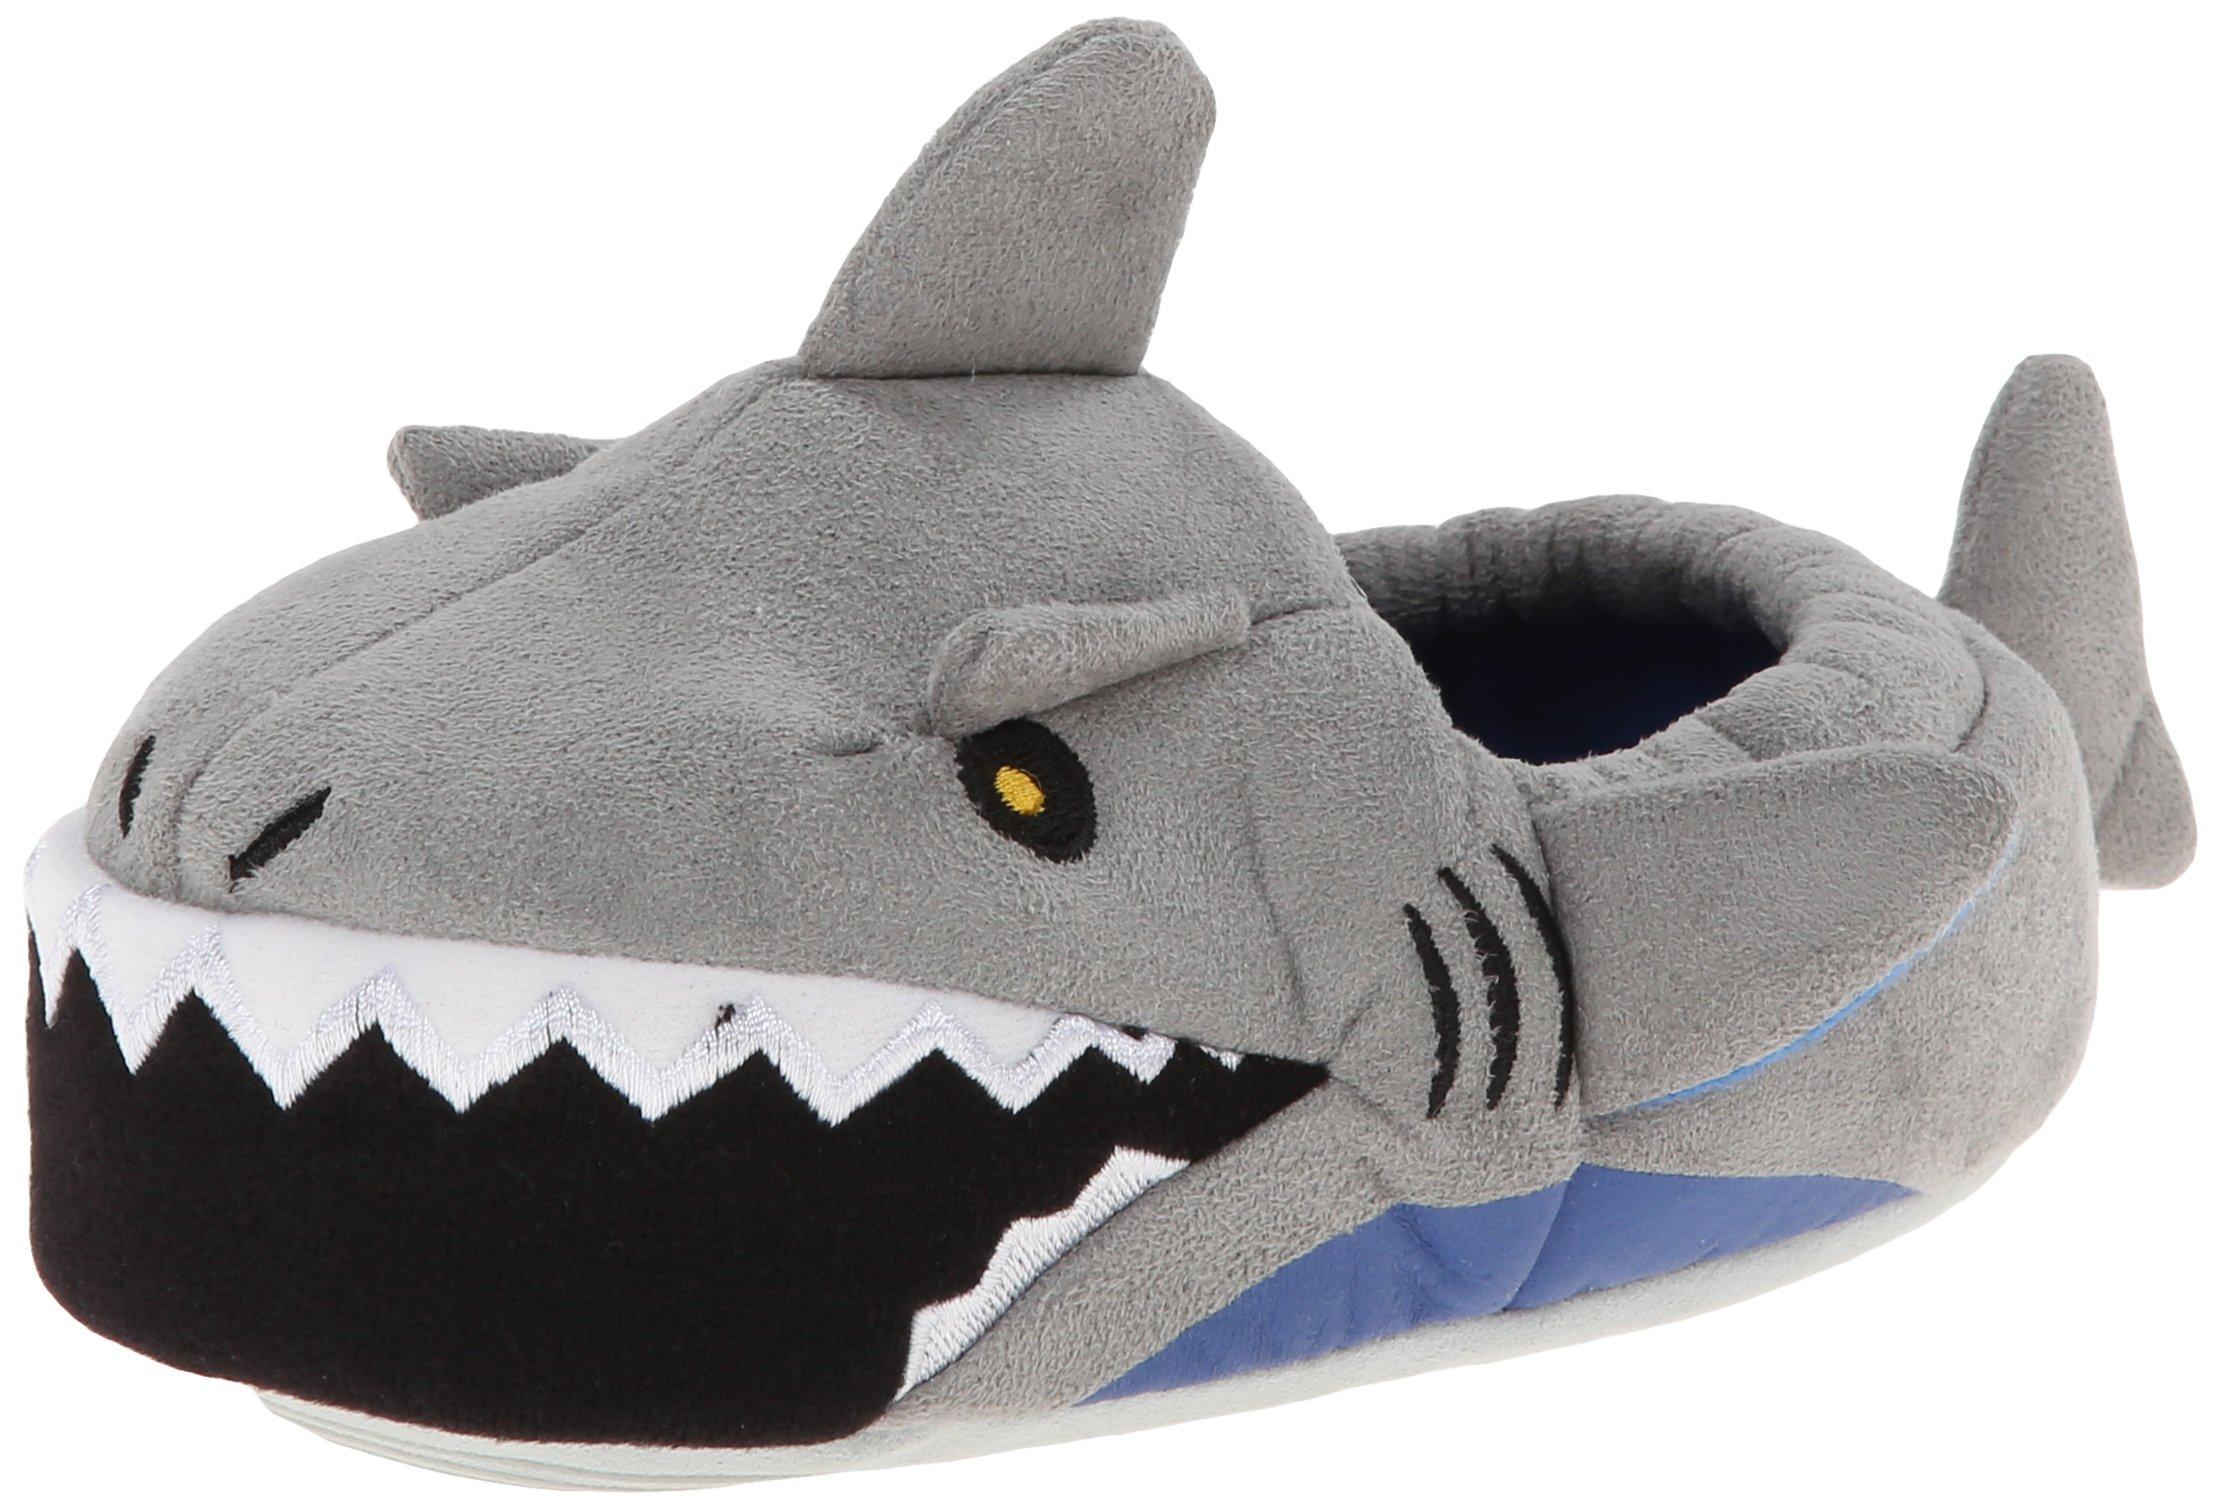 Stride Rite Boy's Light-Up Mouth Shark Slipper, Grey, 13-1 M US Little Kid